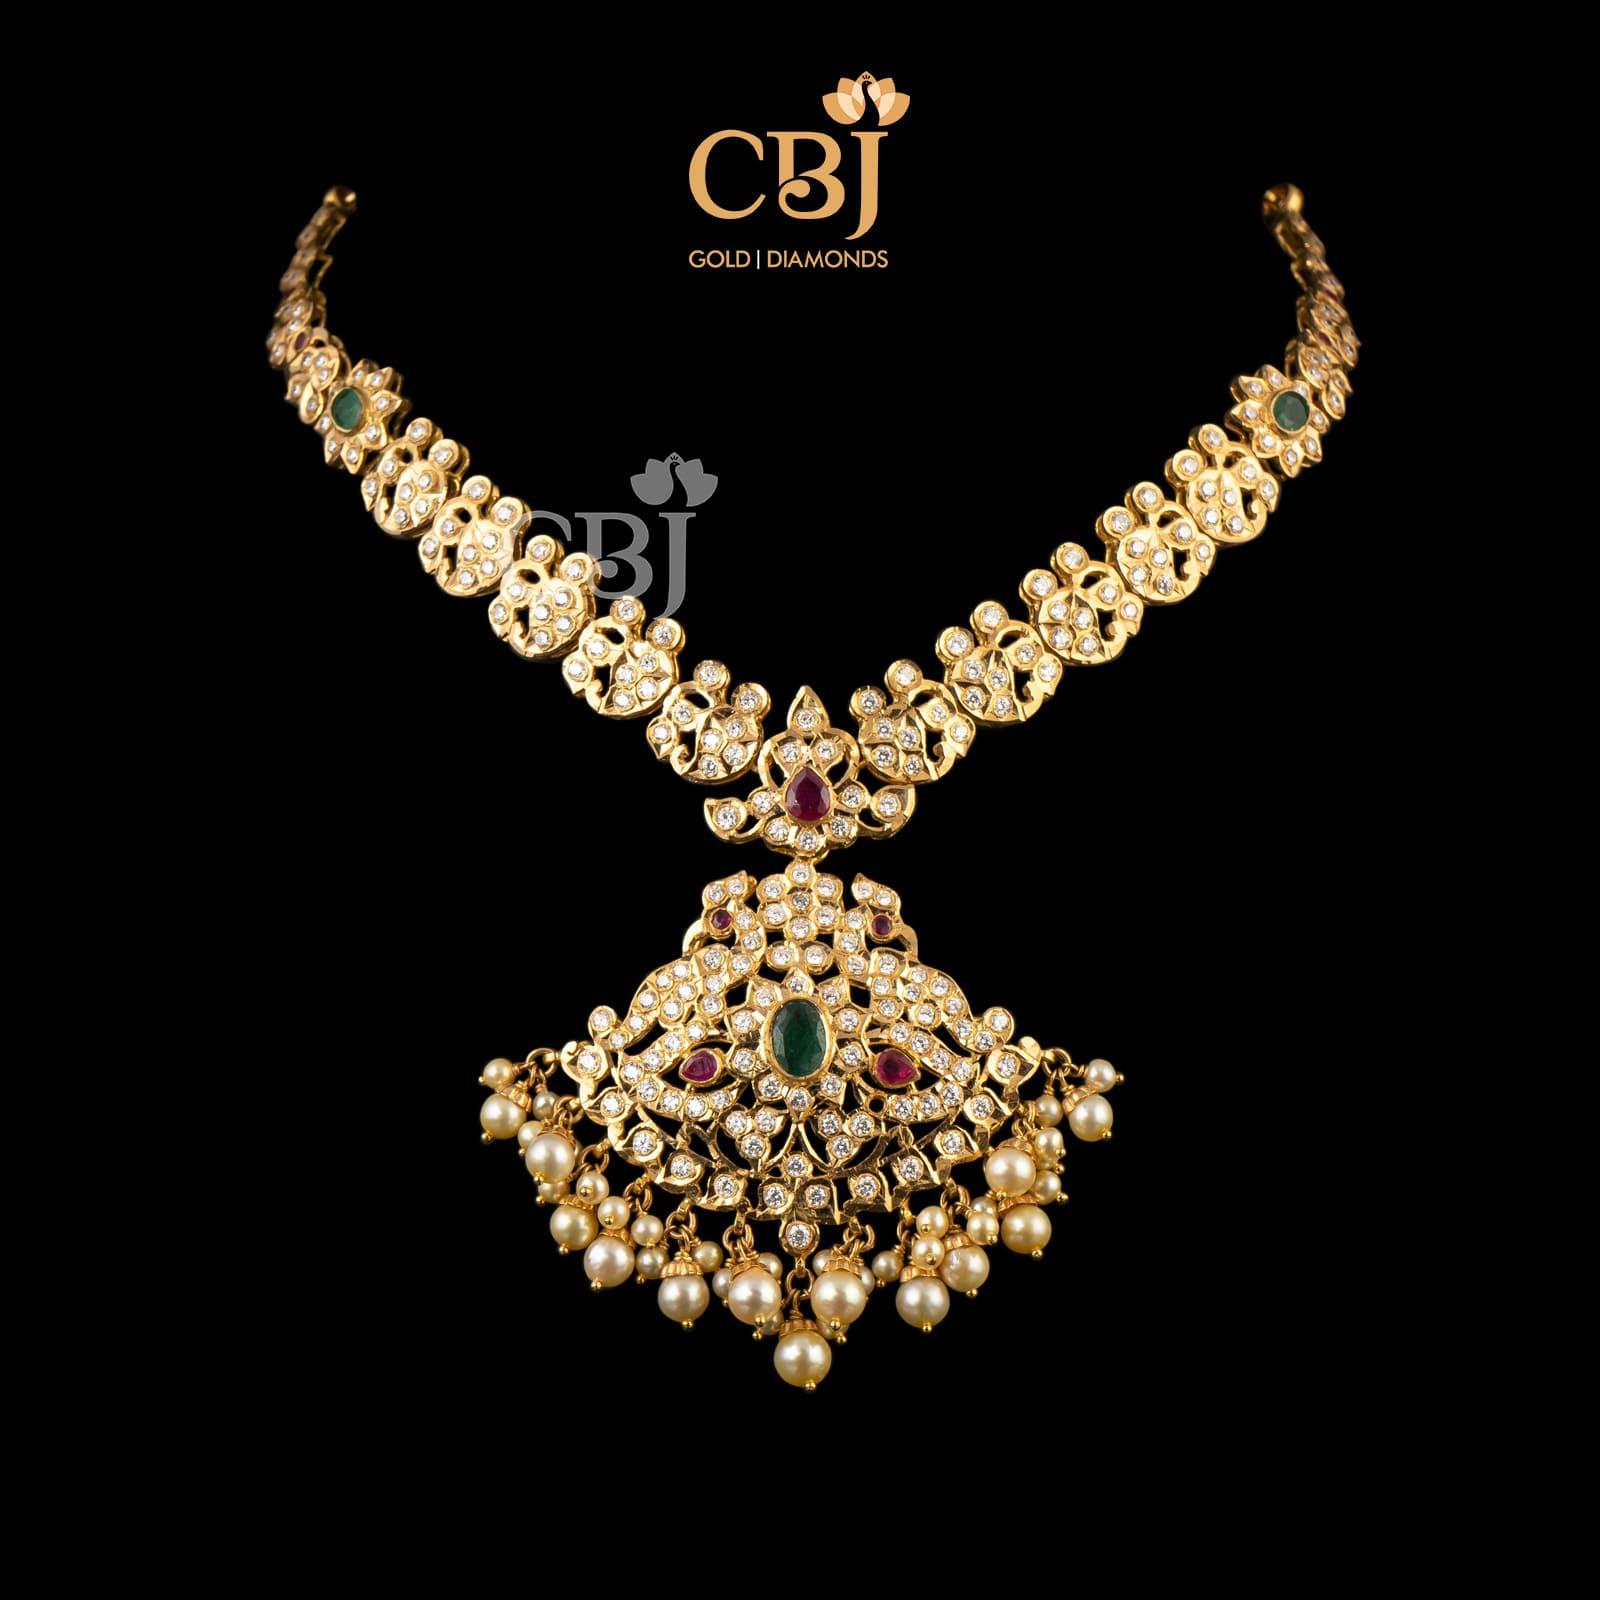 gold cz stone necklace